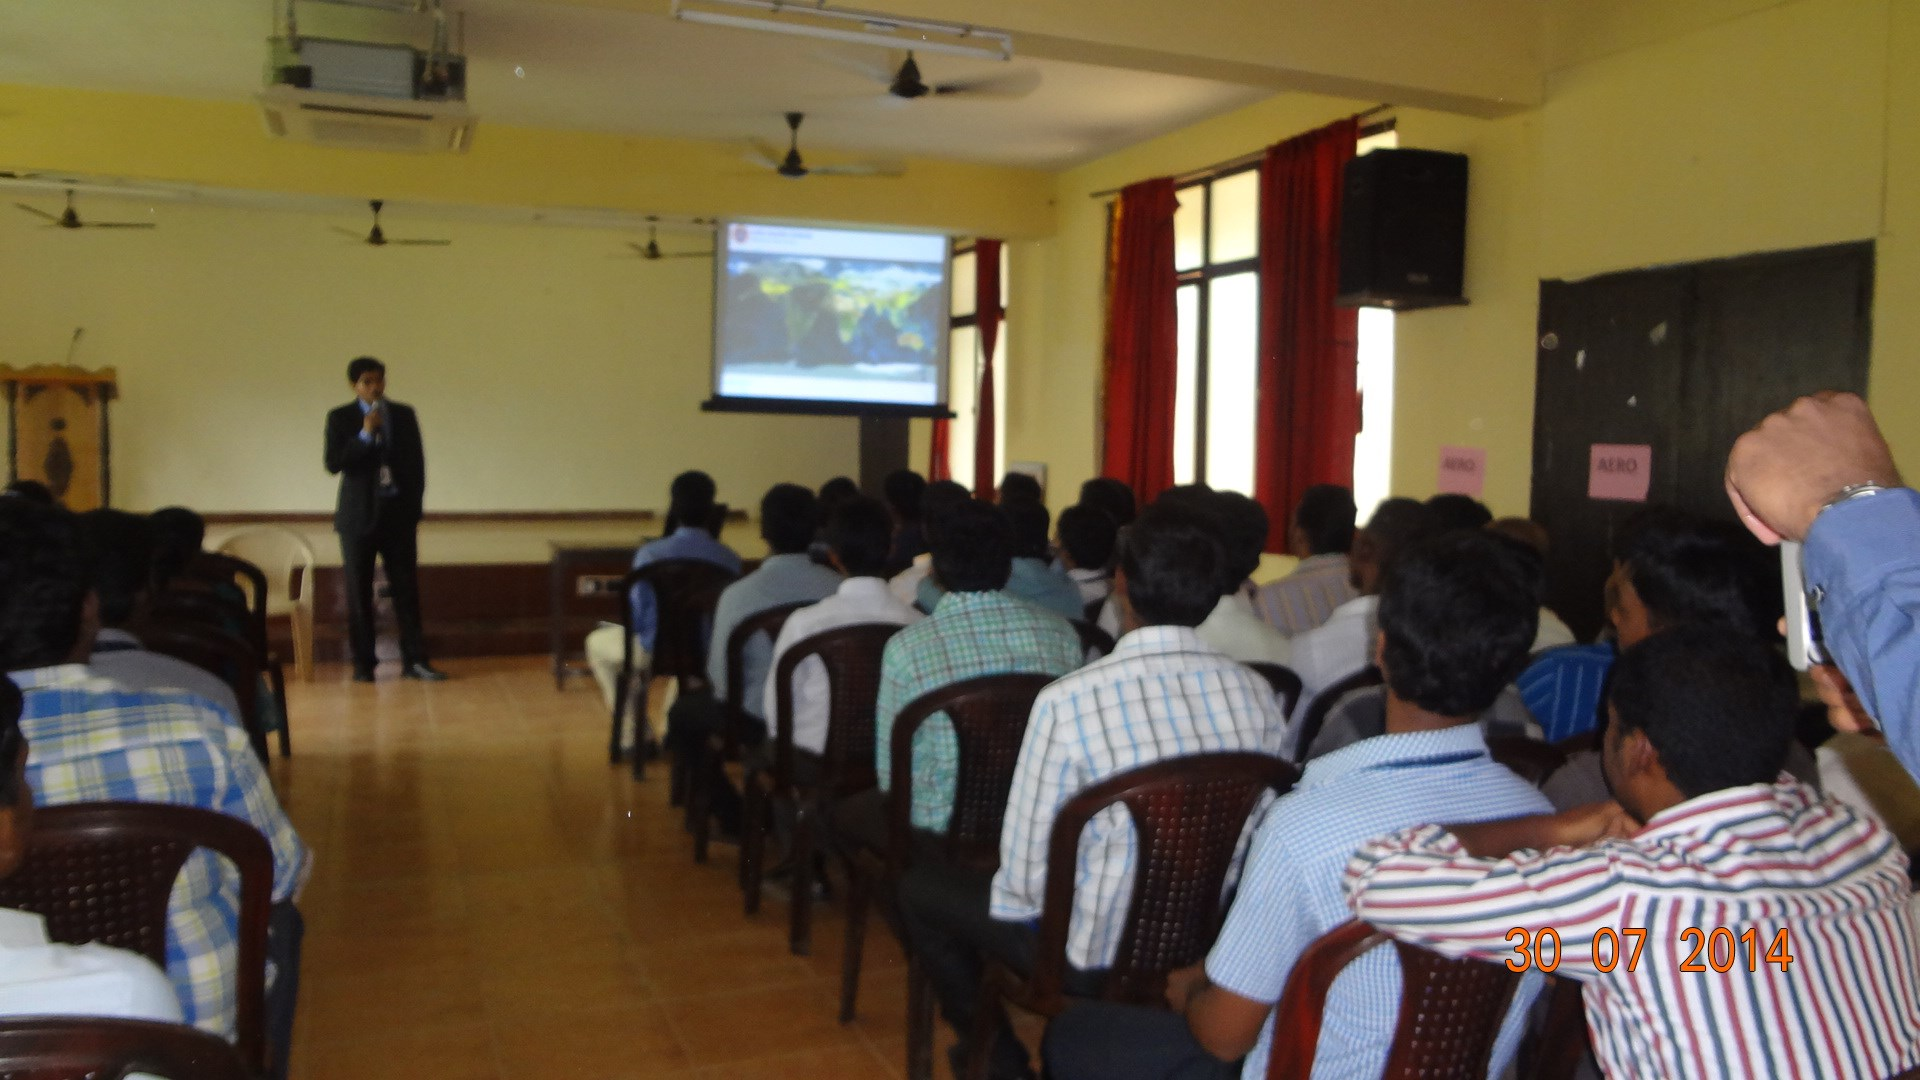 avel flight school career awareness presentation at gojan school of